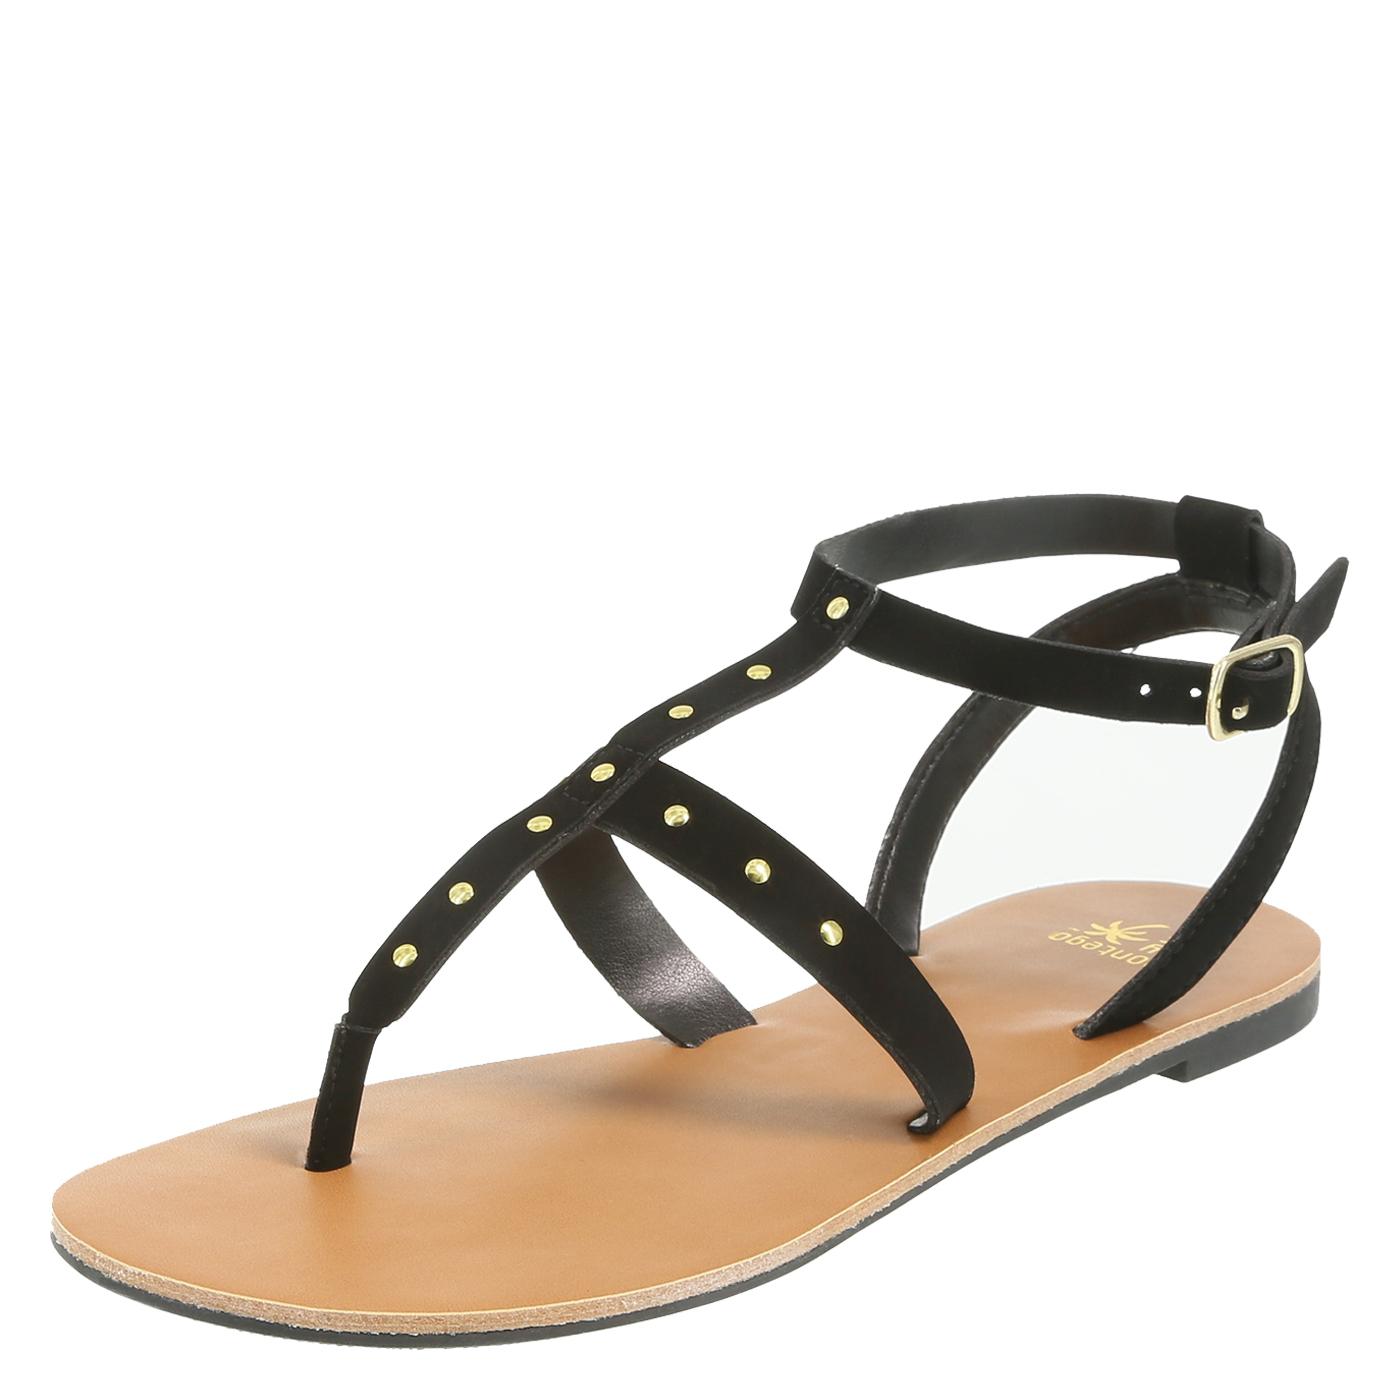 womens sandals womenu0027s ruben studded flat sandal, black, hi-res zydcjac